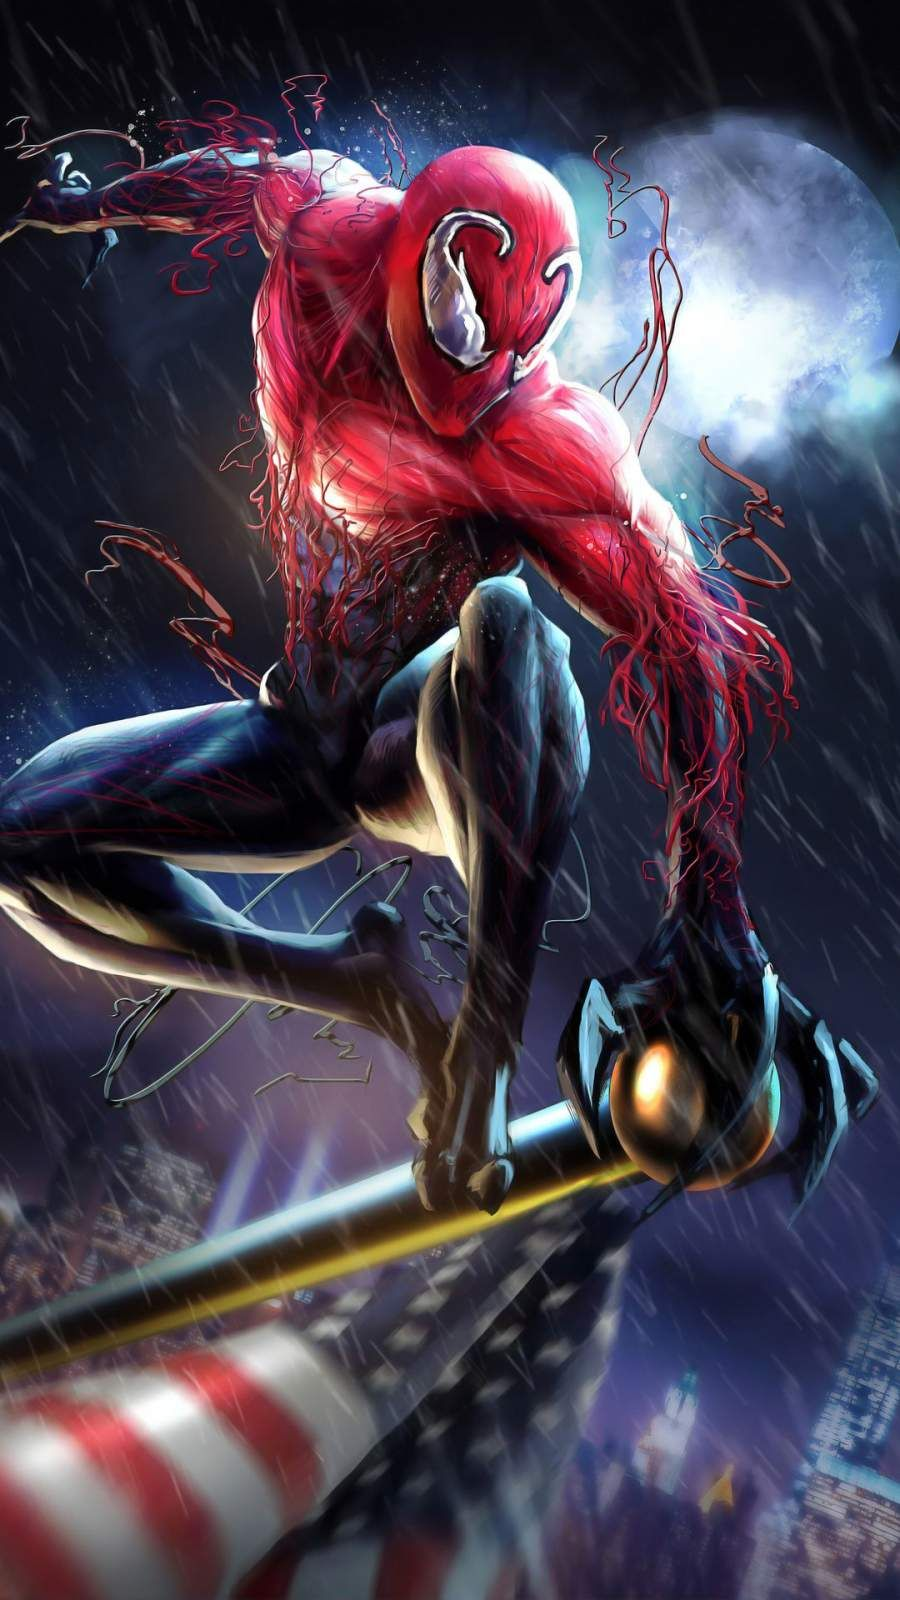 Venom Spiderman IPhone Wallpaper in 2020